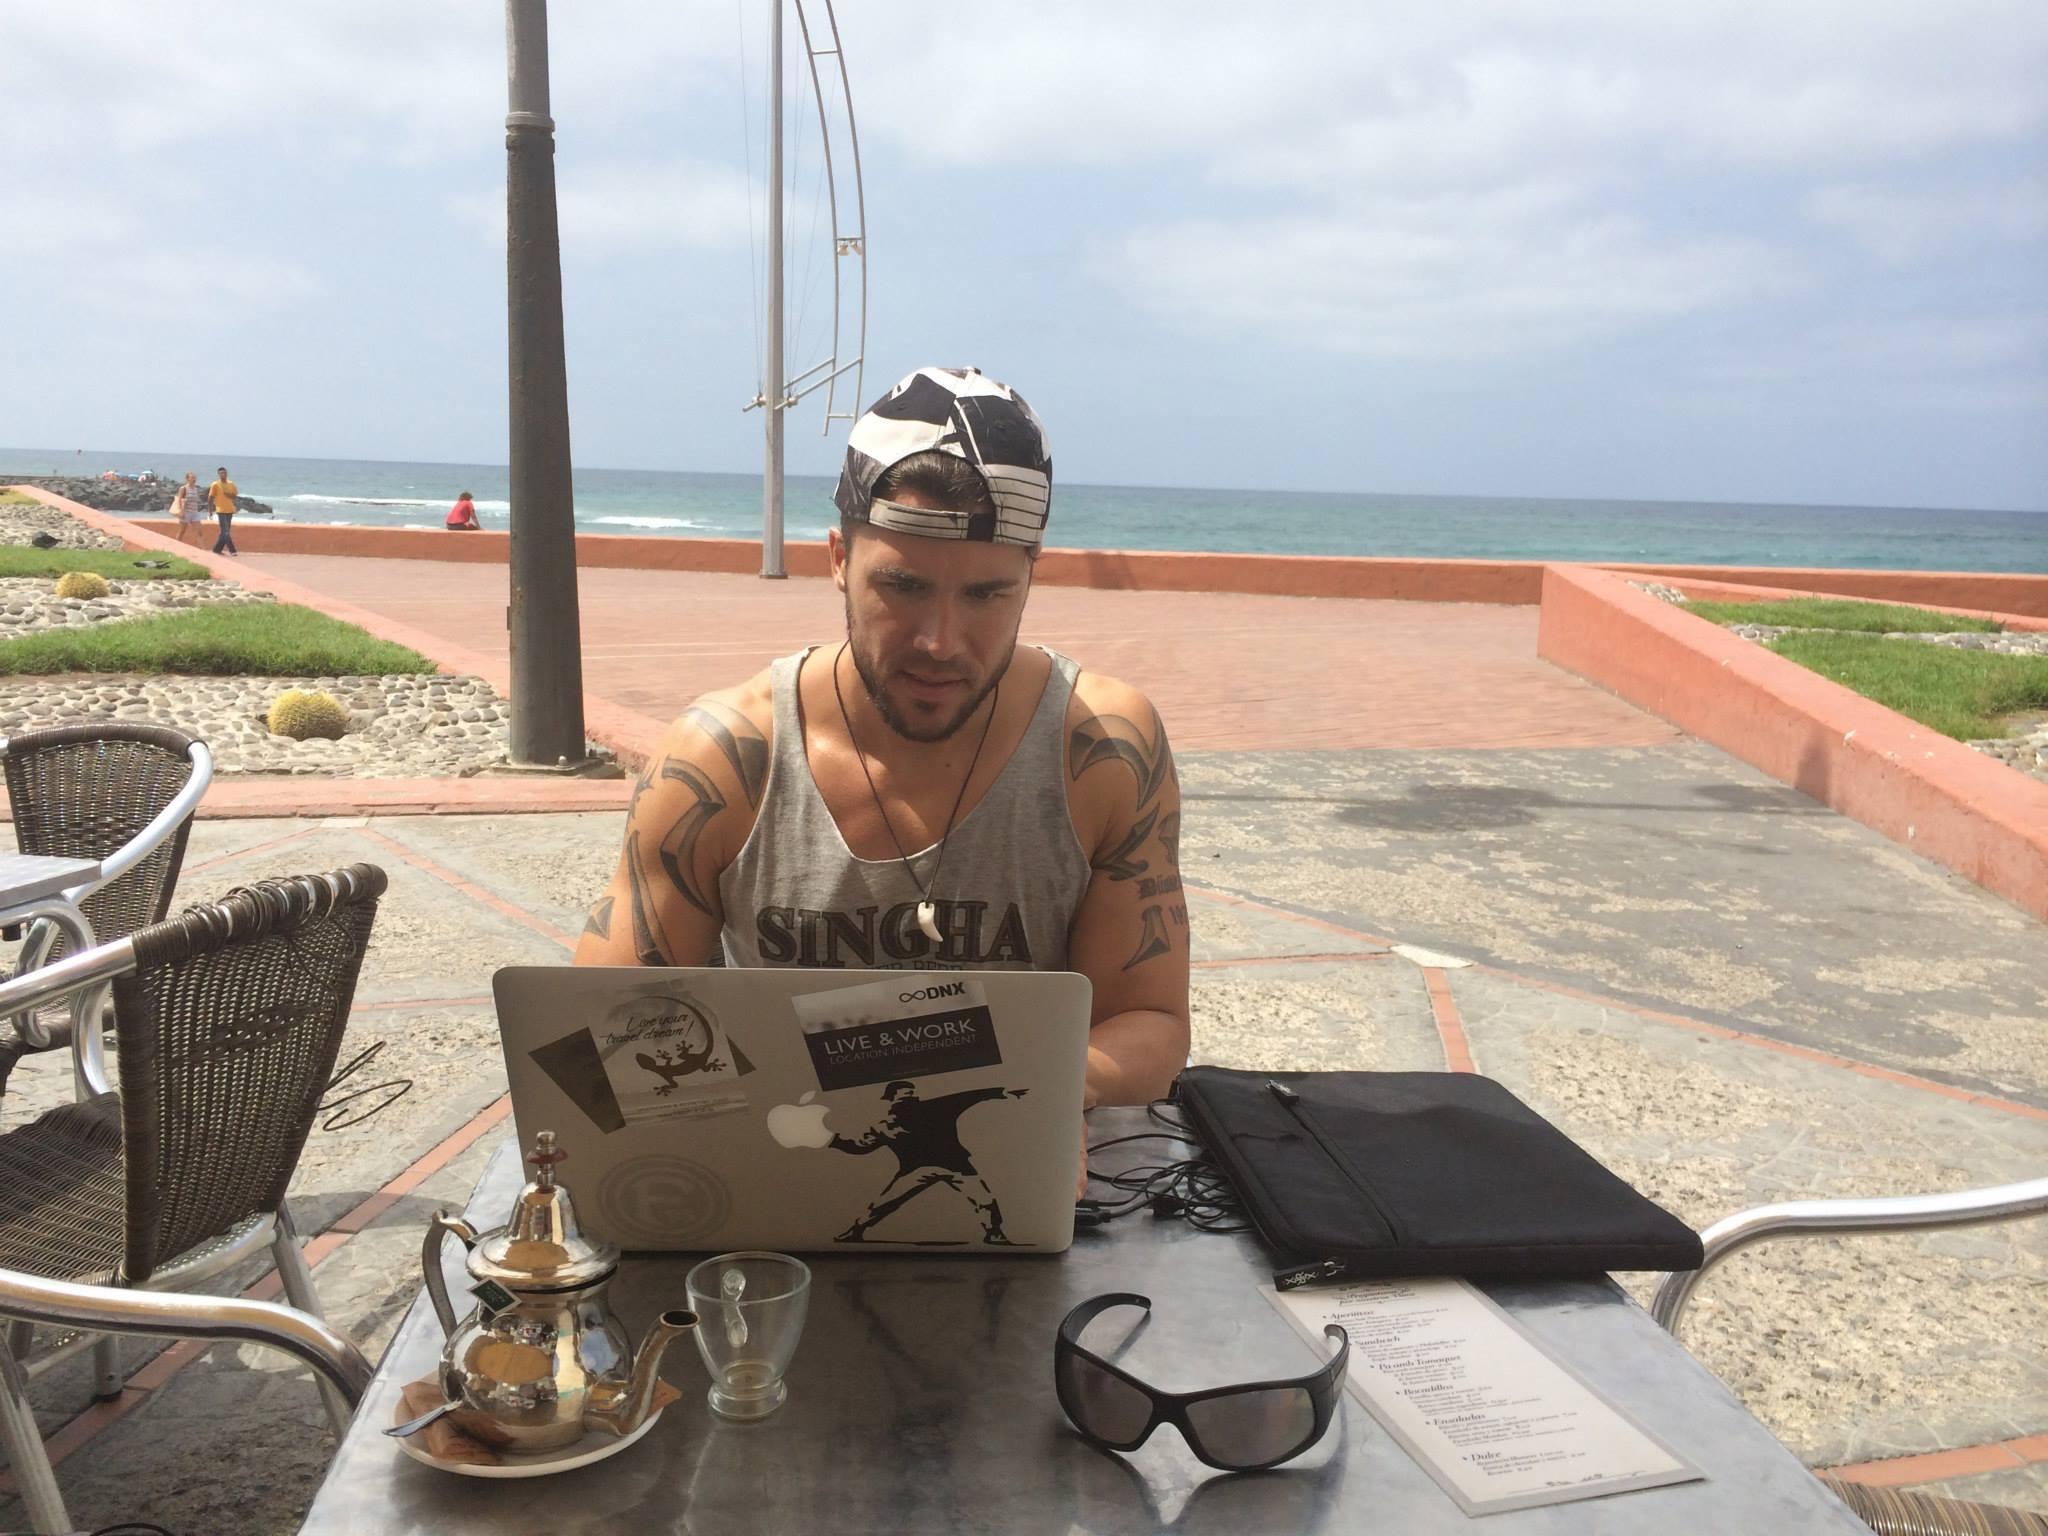 Meet Marcus Meurer, digital nomad (DE)